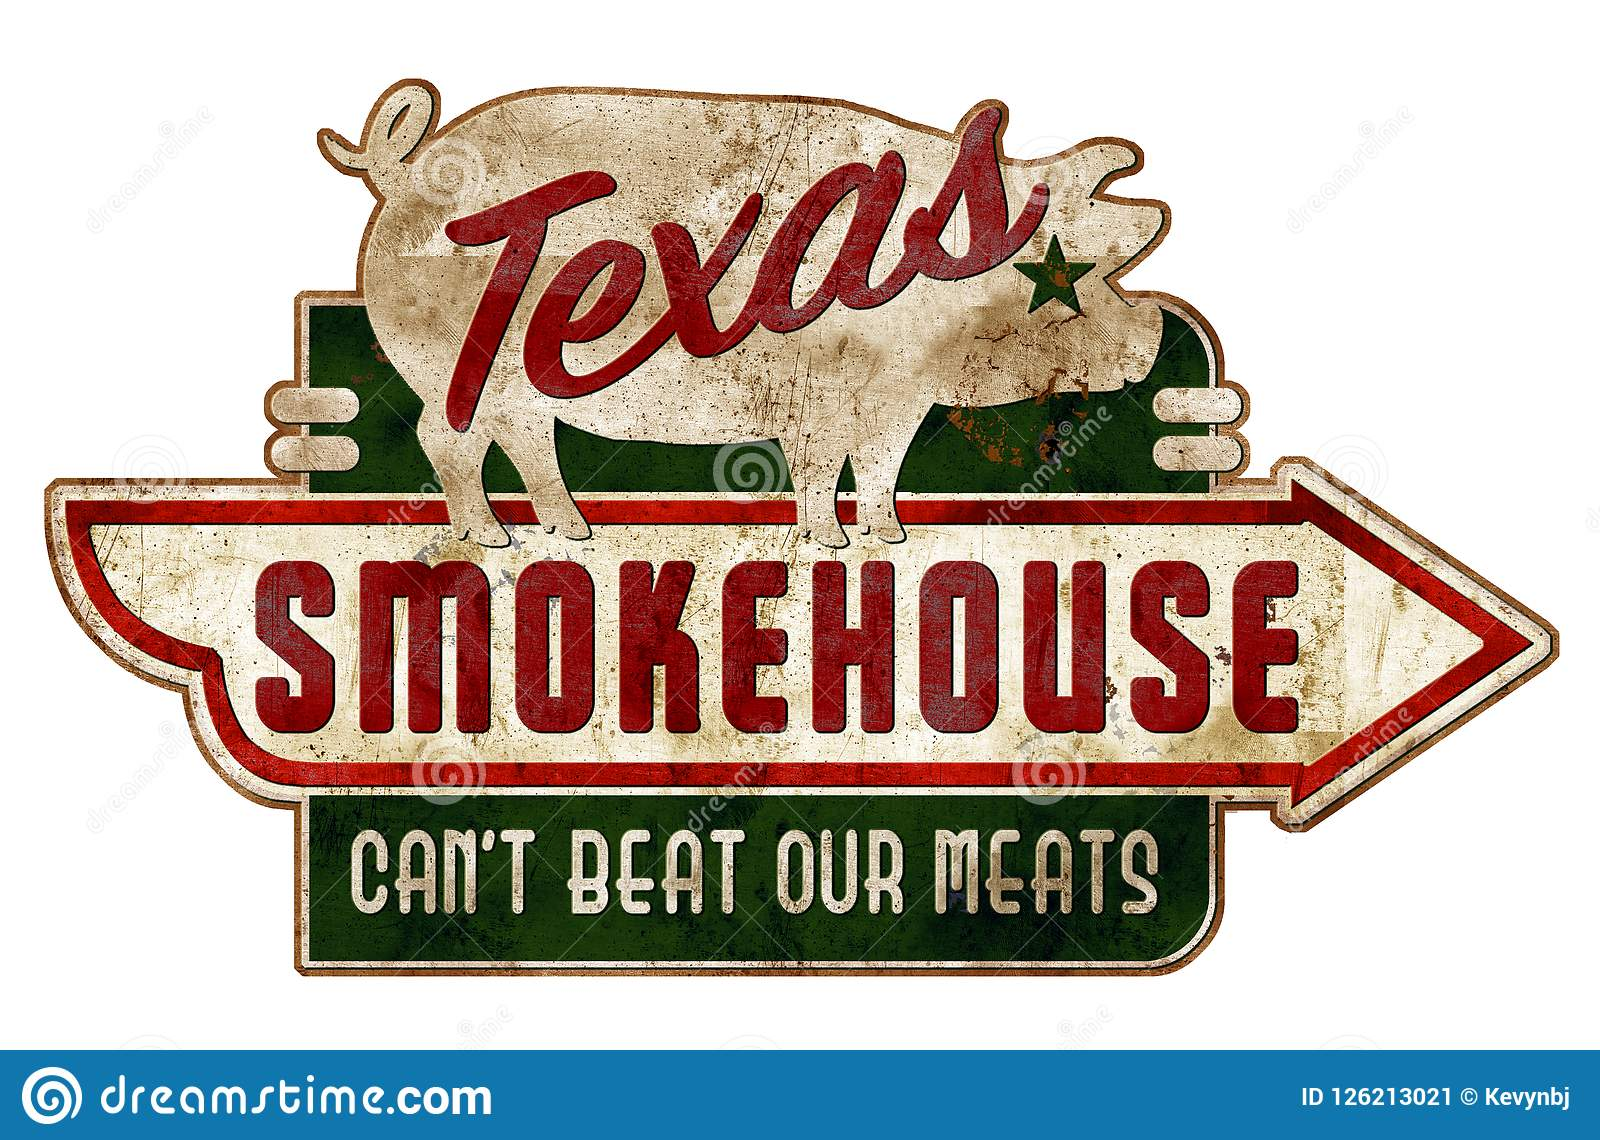 Smokehouse Sign Texas Vintage Grunge Ribs Real